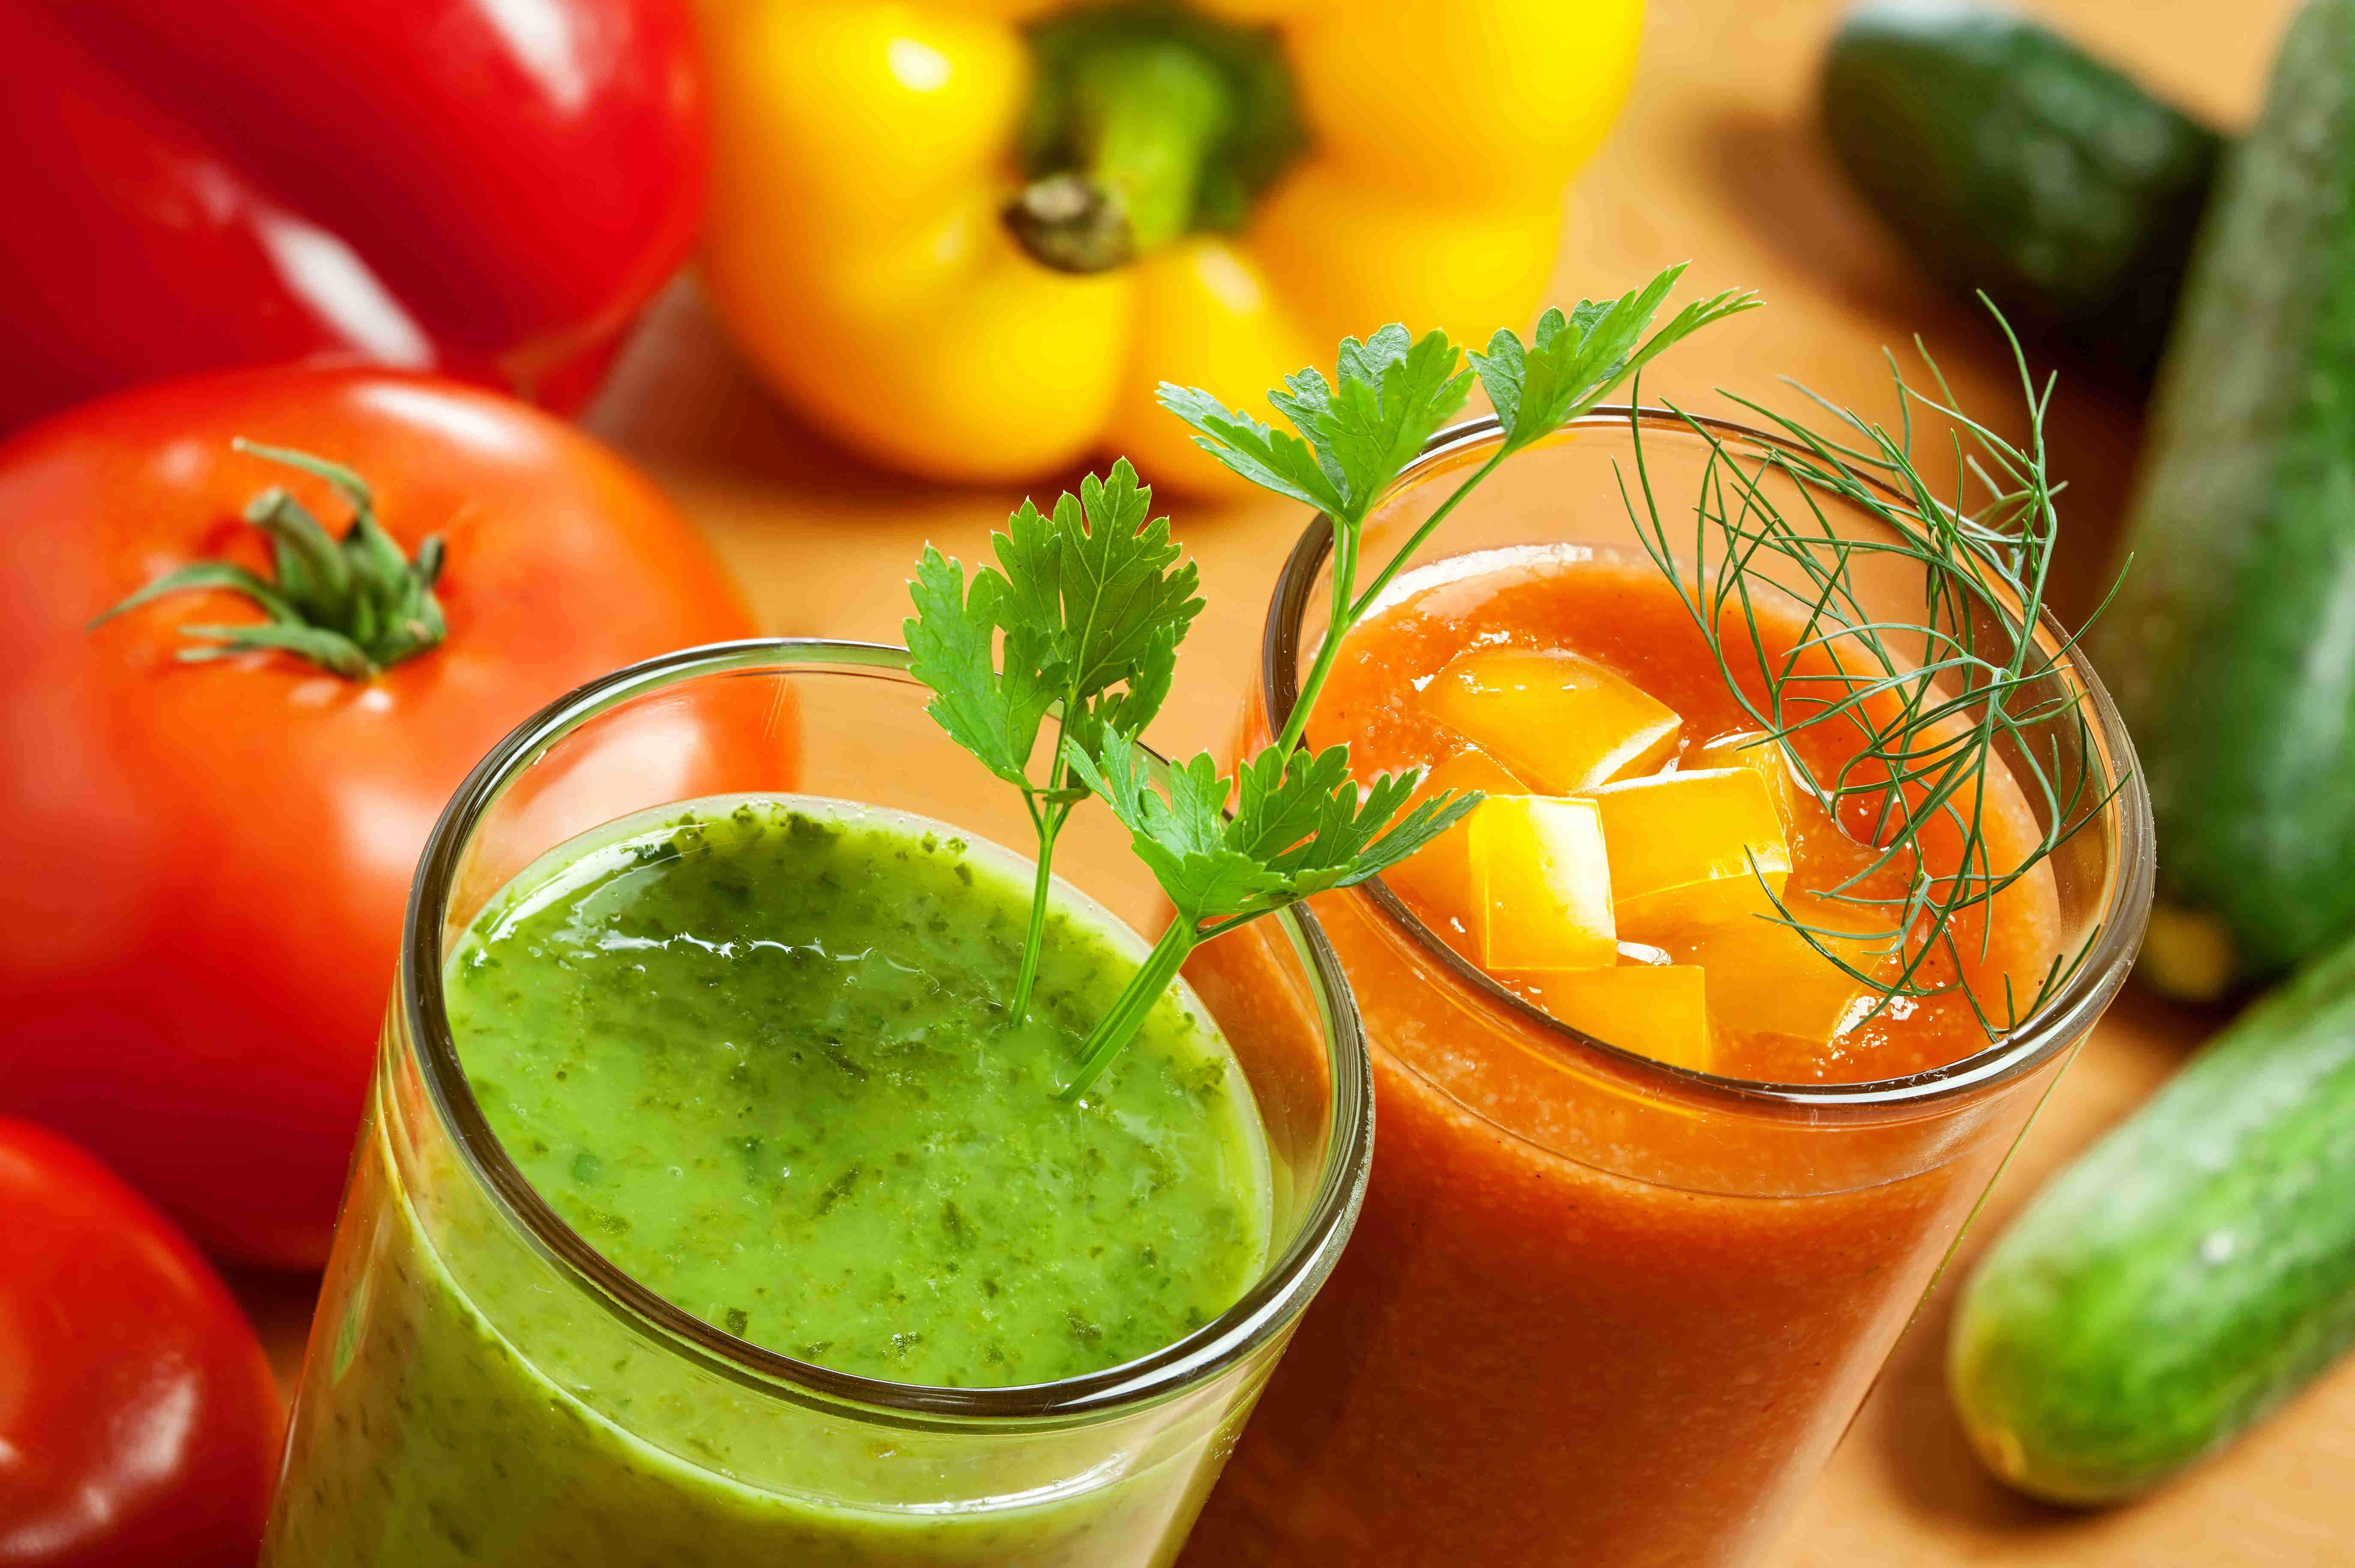 Mangiare in estate  - Al caldo in forma